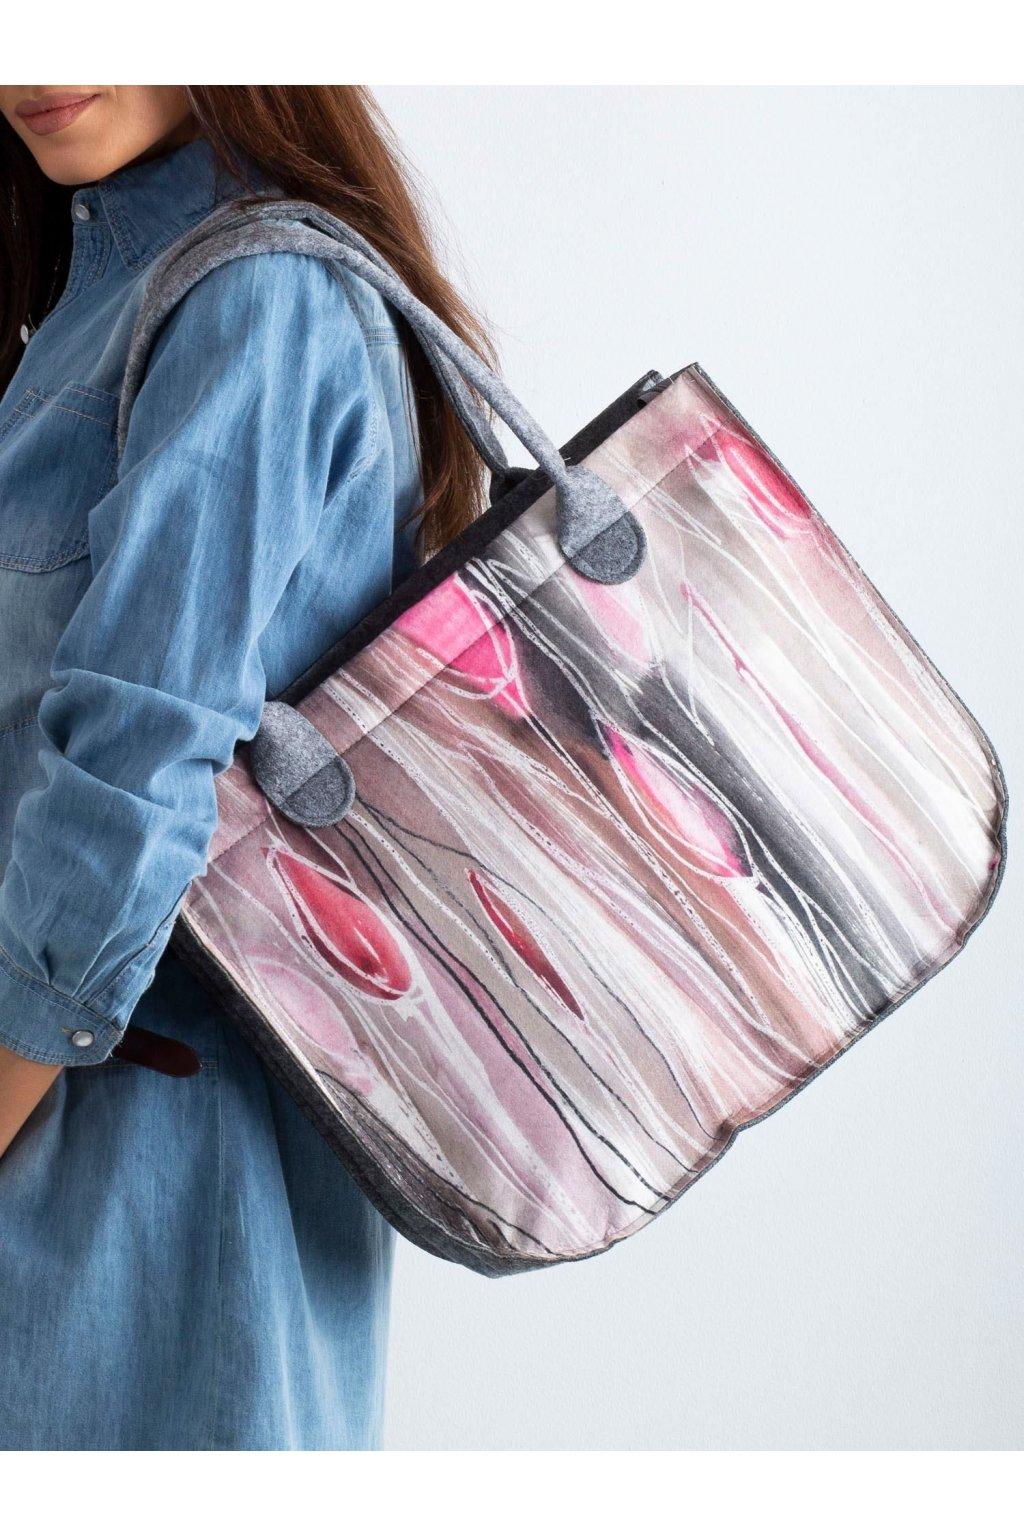 Shopper kabelka sivo-ružová kód CE-TR-093.85P/LadyTULIPANY